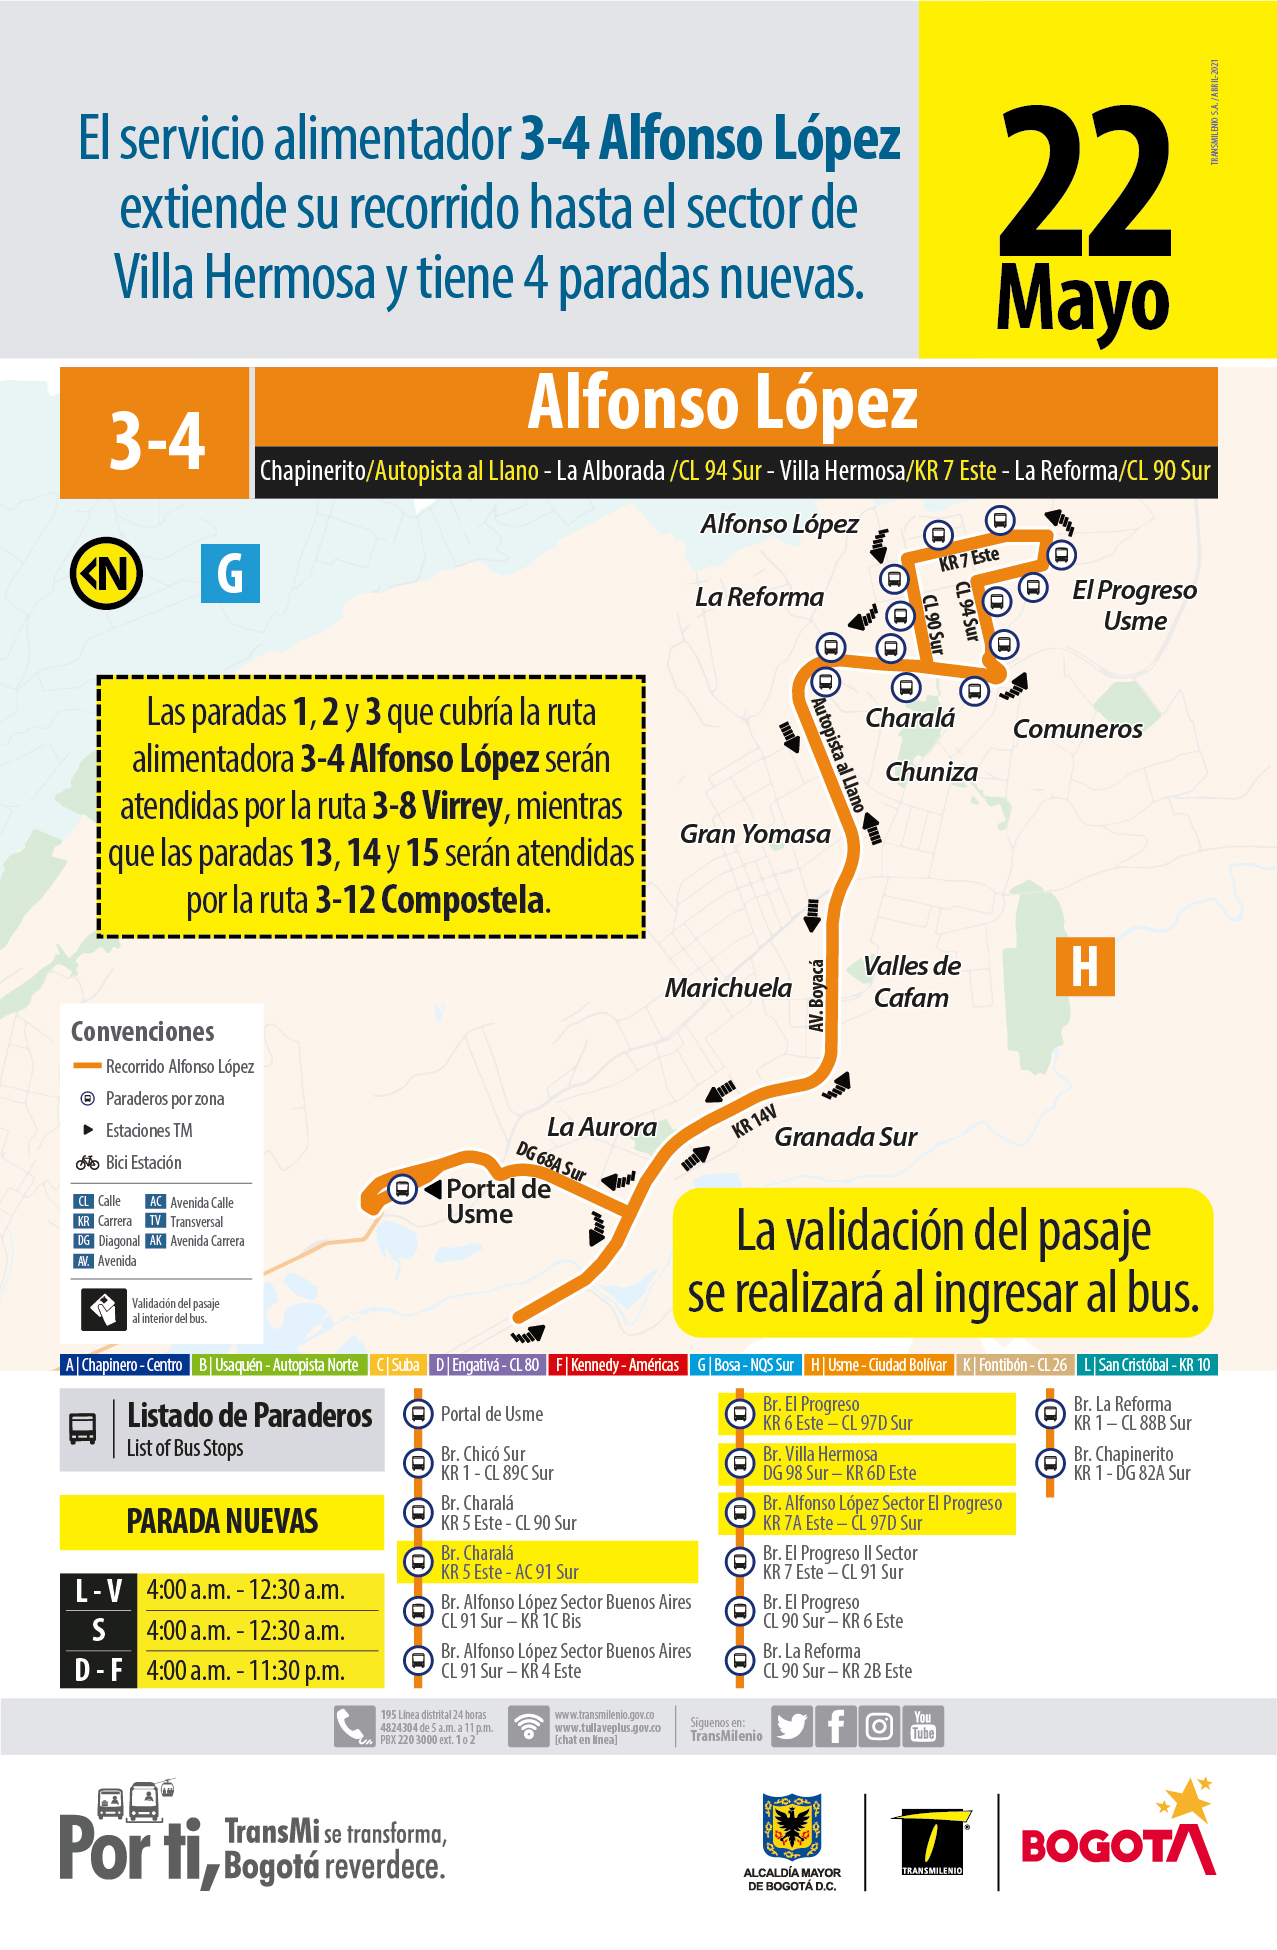 3-4 Alfonso López